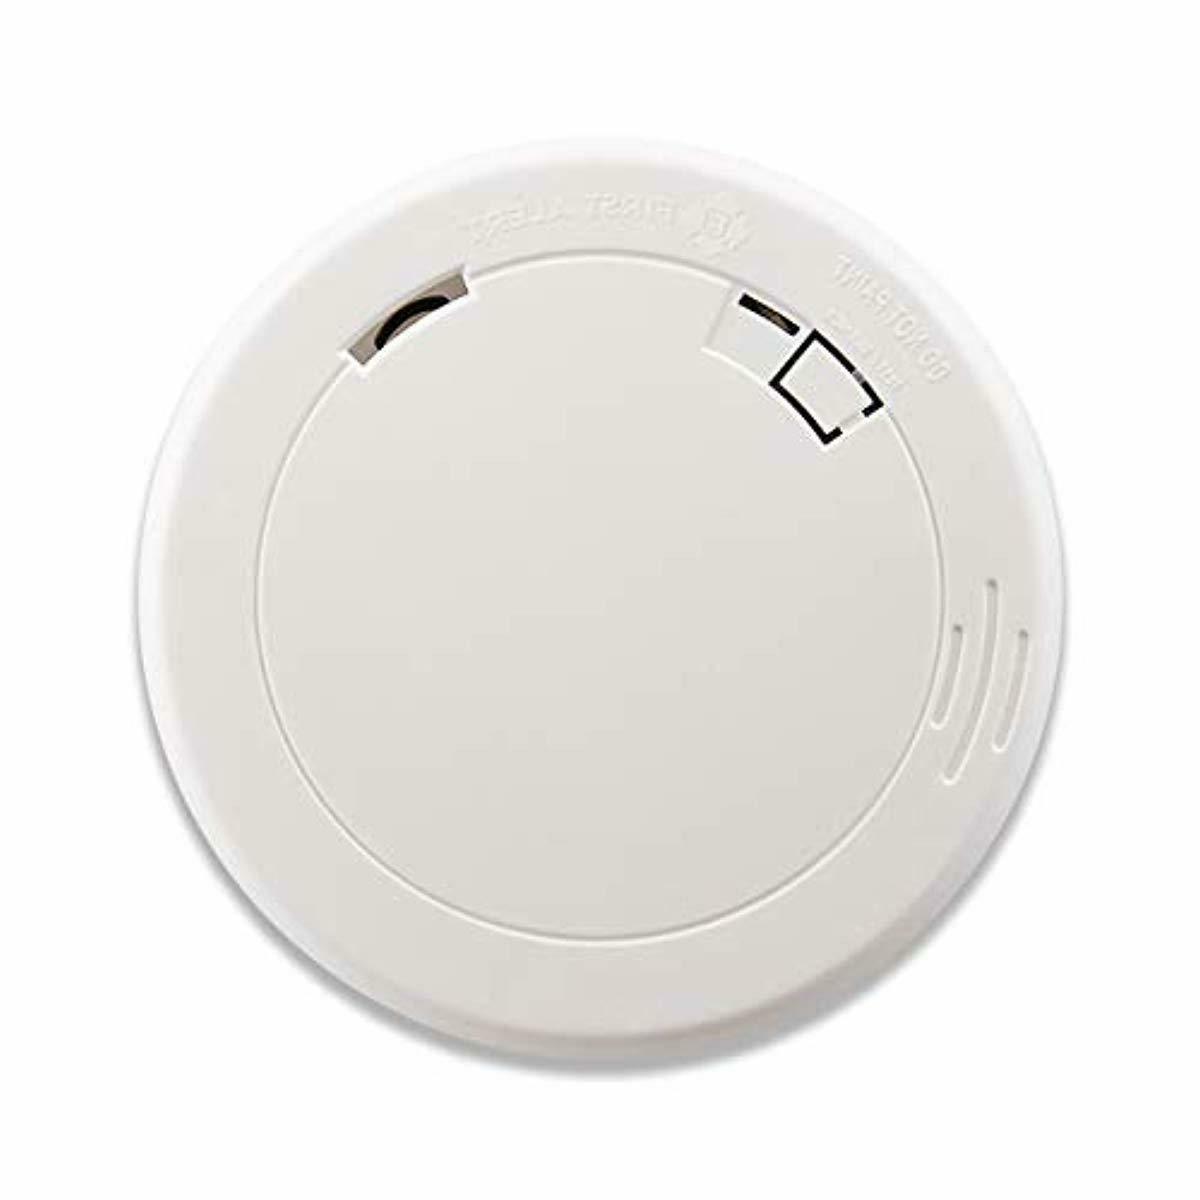 pr710 slim photoelectric smoke alarm with 10